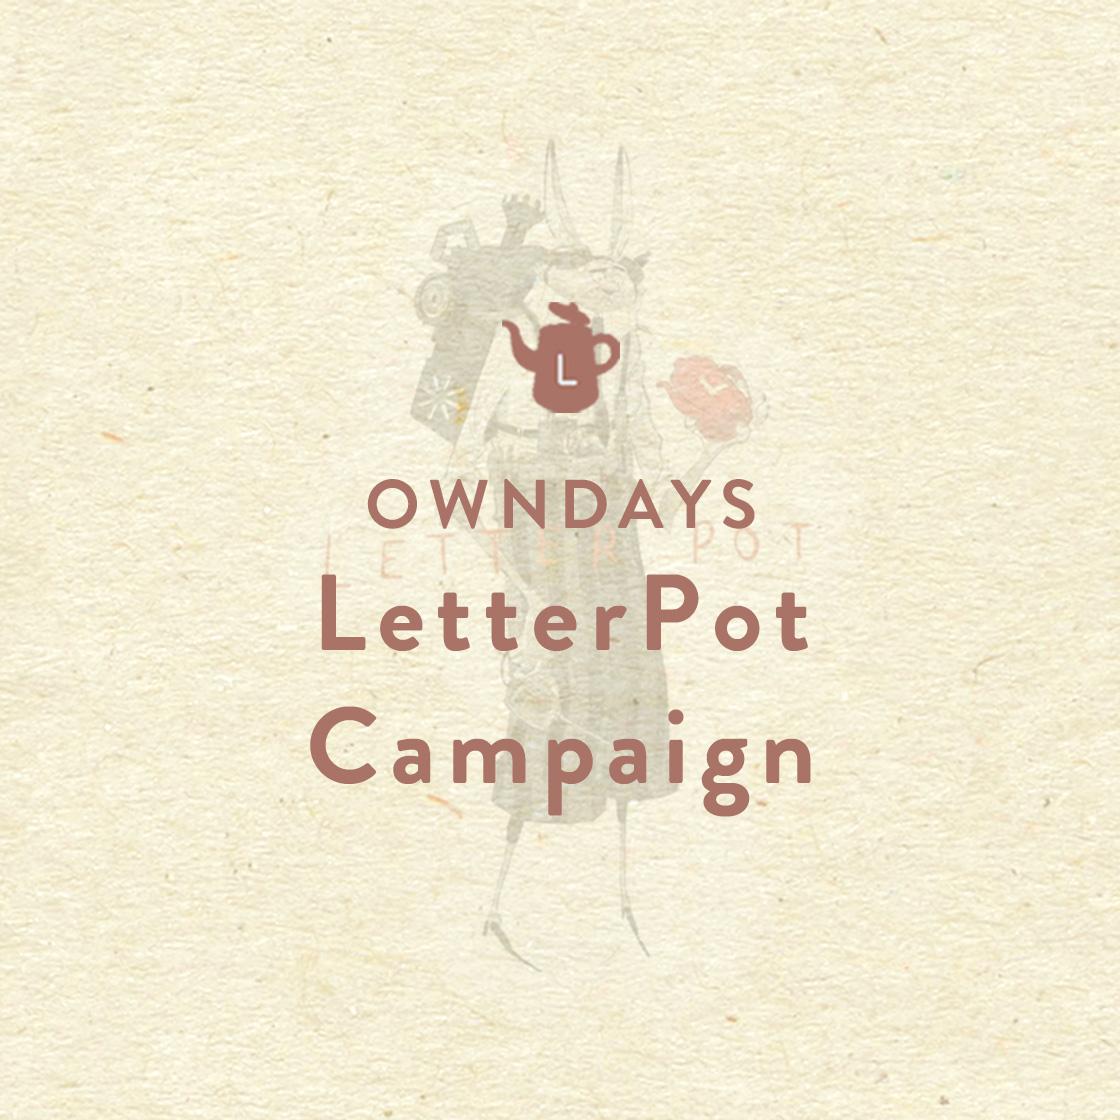 LetterPot Campaign